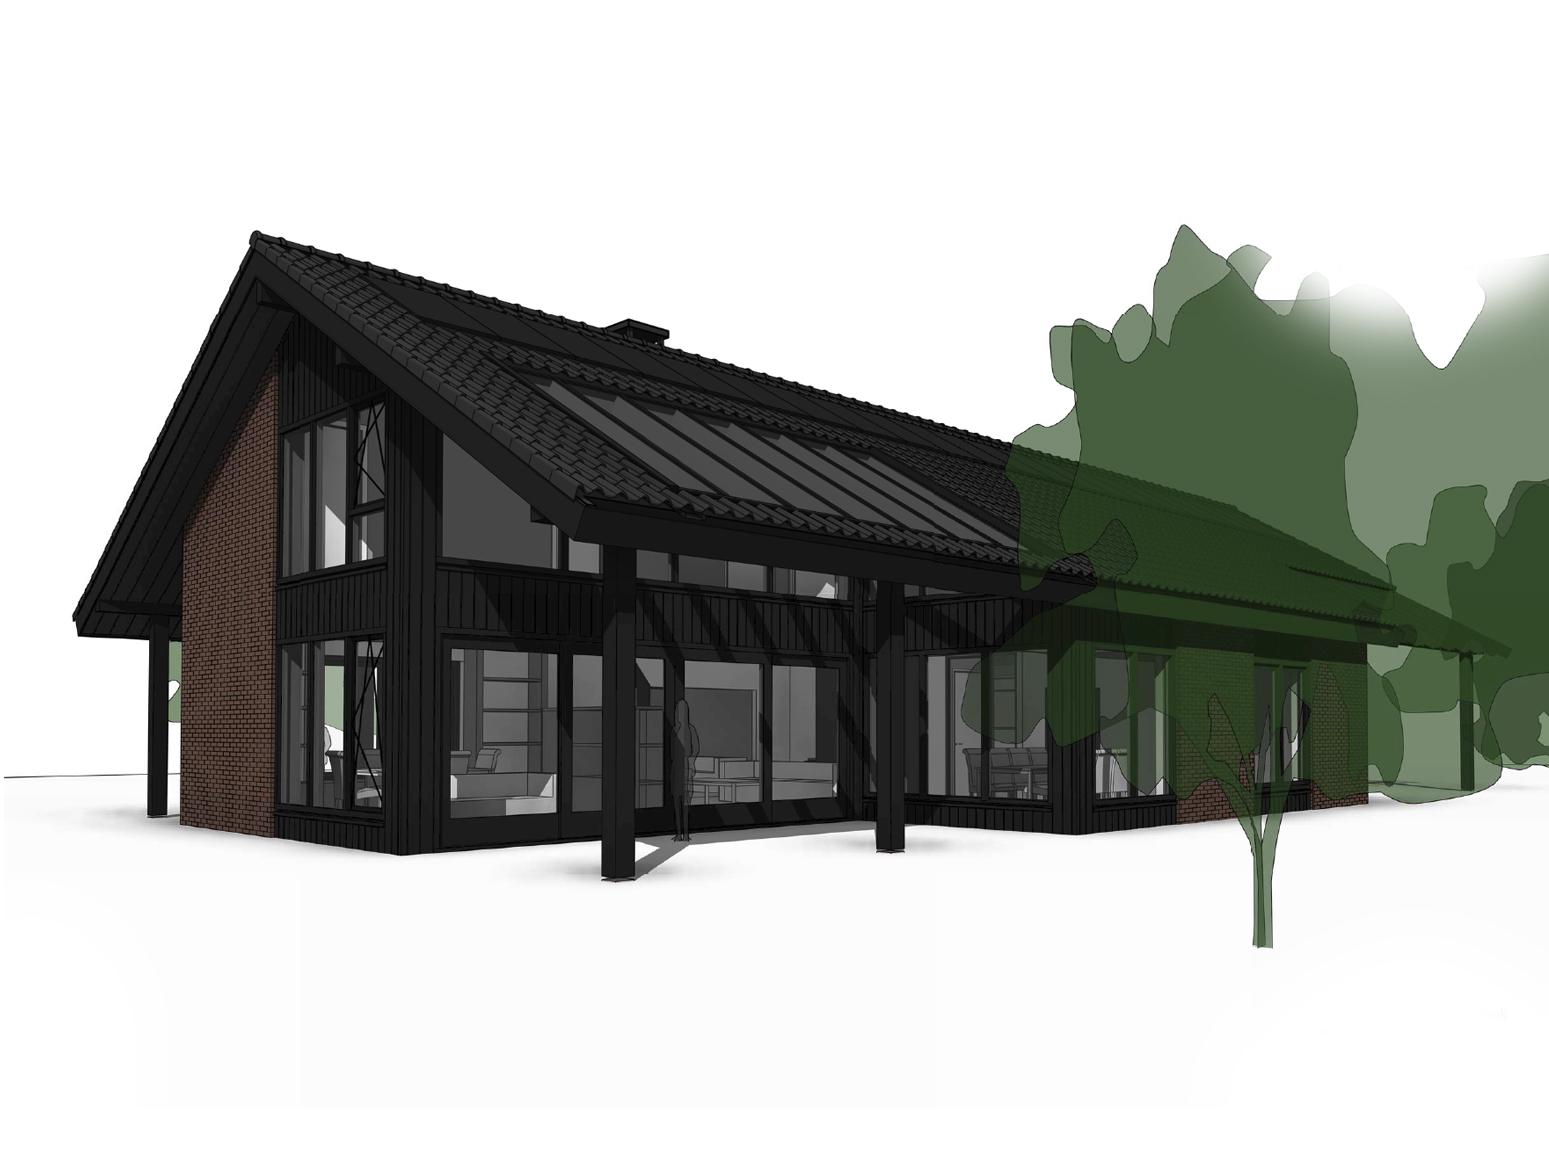 stoer-schuurwoning-klarenbeek-metselwerk-donker-van-oord-architectuur-en-design-wenum-wiesel-architect-voorst-architect-apeldoorn